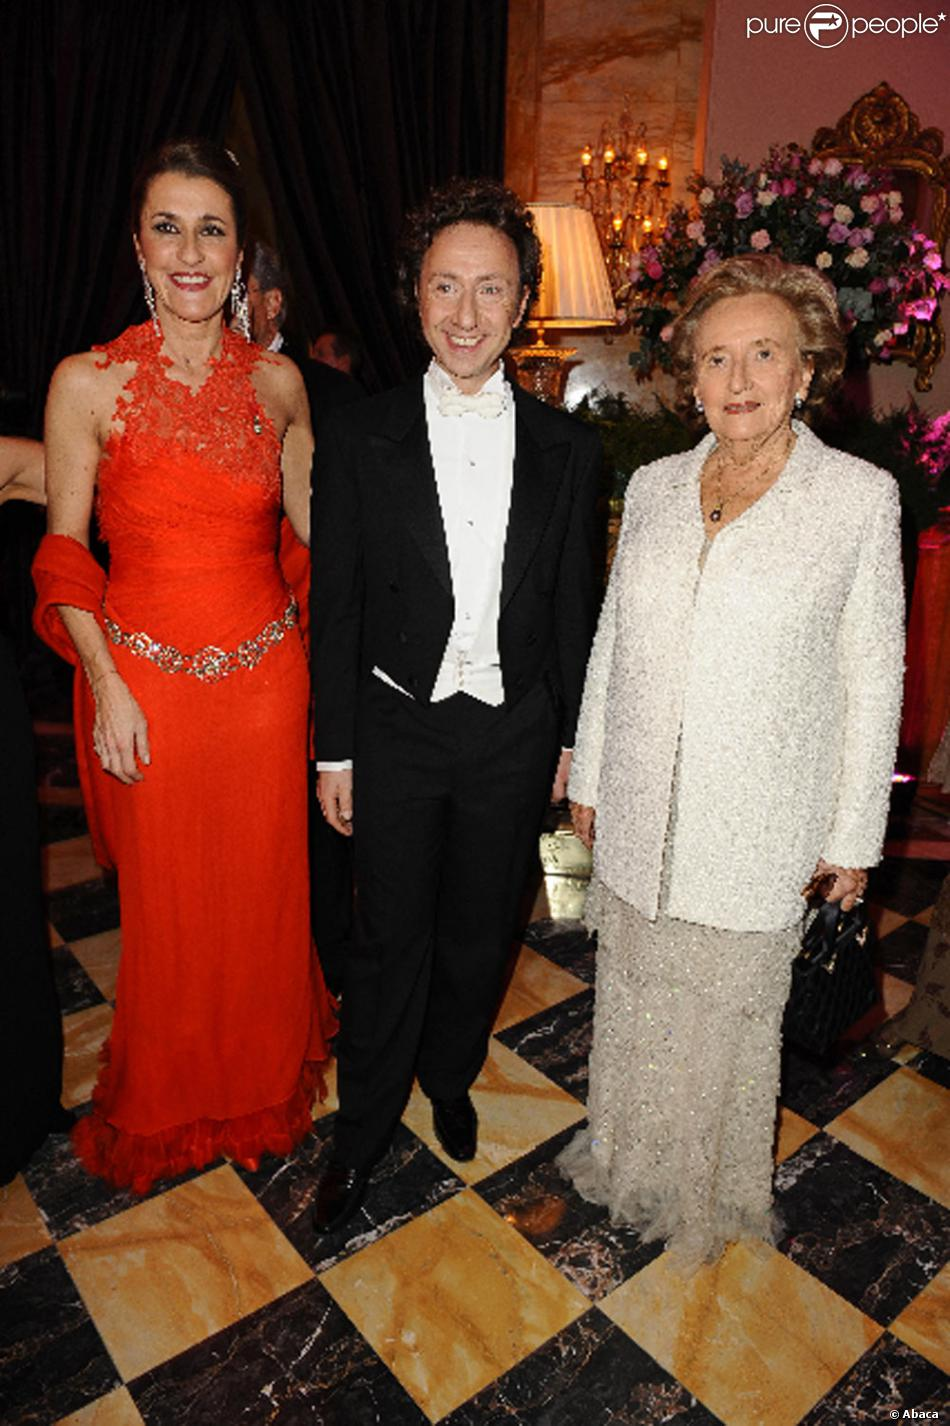 St phane bern et bernadette chirac au bal des d butantes - Stephane marie et sa compagne ...